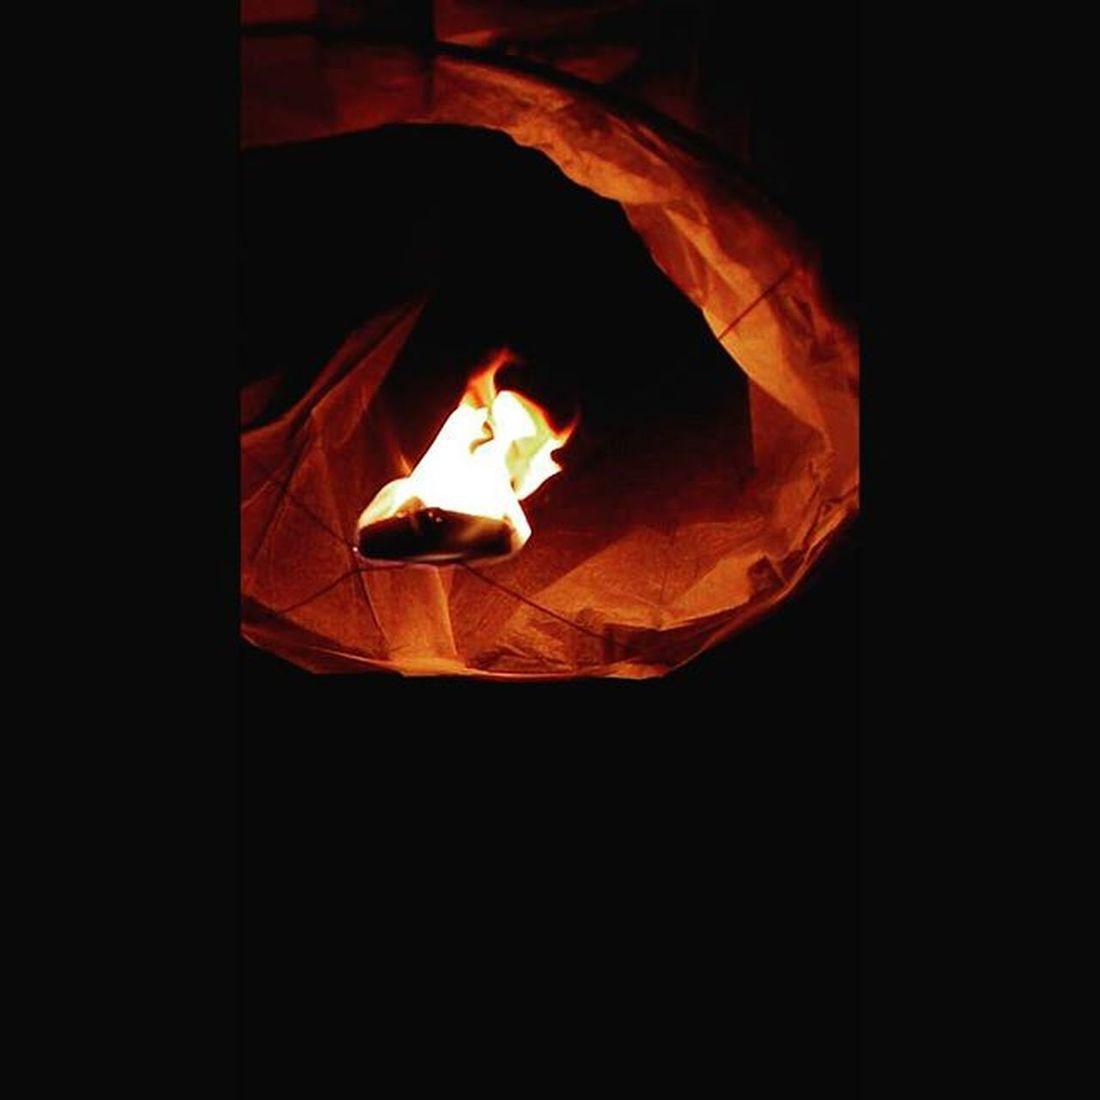 I set fire to the rain 😎 Squareinstapic Fire Lamp Firelamp F4F L L4l Follow4follow Followforfollow Likeforlike Likeback Ngma Wowshot Instalike Instapicture Instagood Instadaily Igers Ig_captures Iger Instamood Instalikes